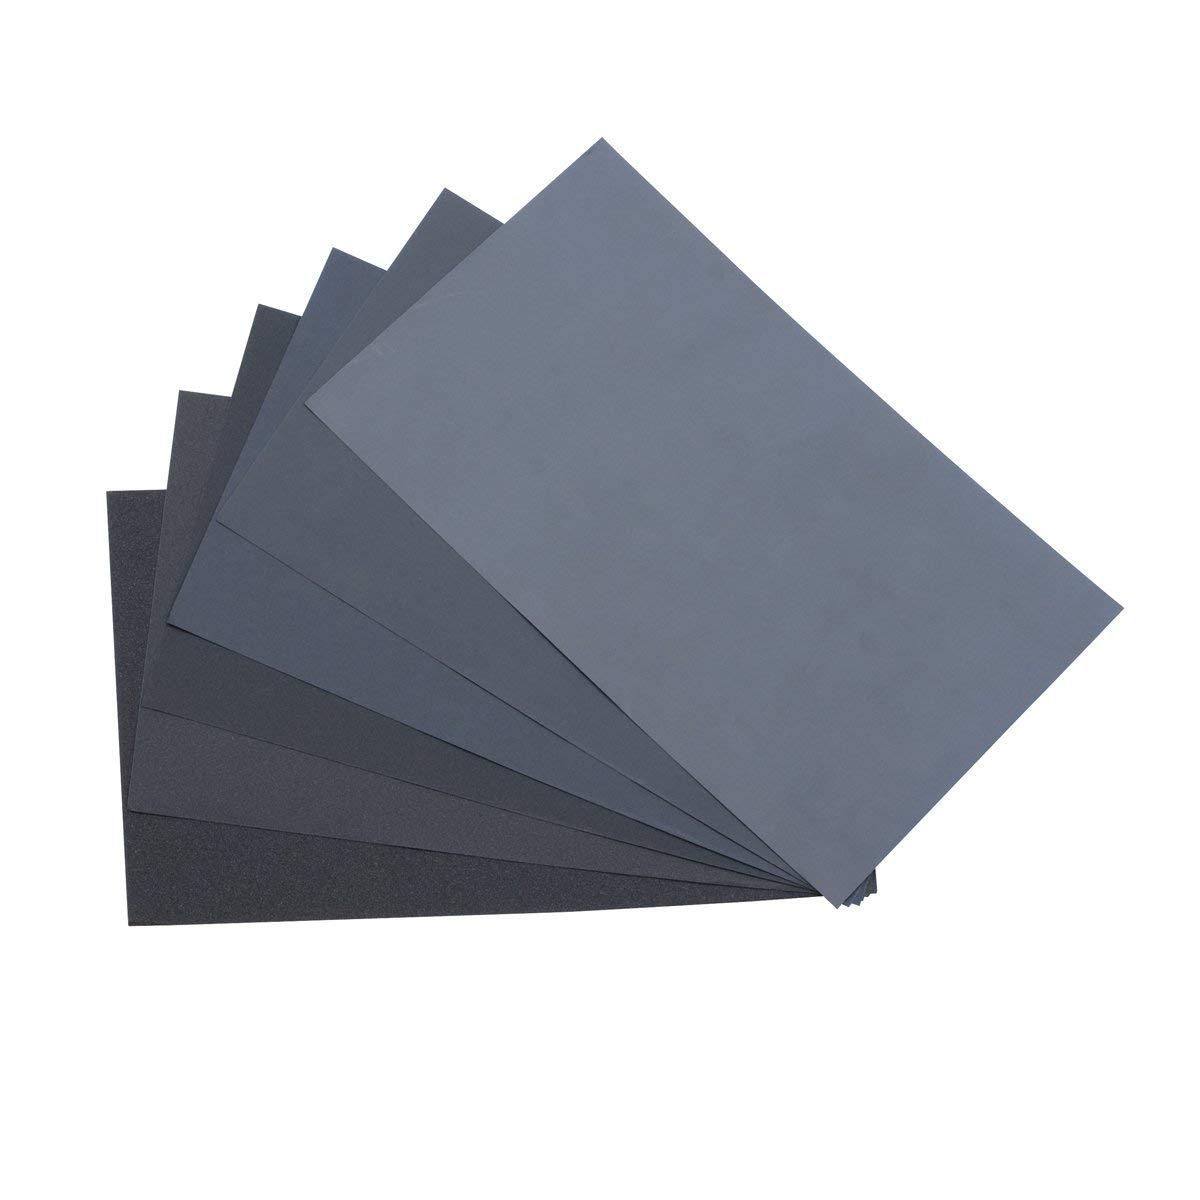 "9"" x 11"" 1,200 Grit Wet/Dry Sanding Paper - 10 Sheets Jewelry Making Ceramic Glass Stone Metal Finishing Abrasives"